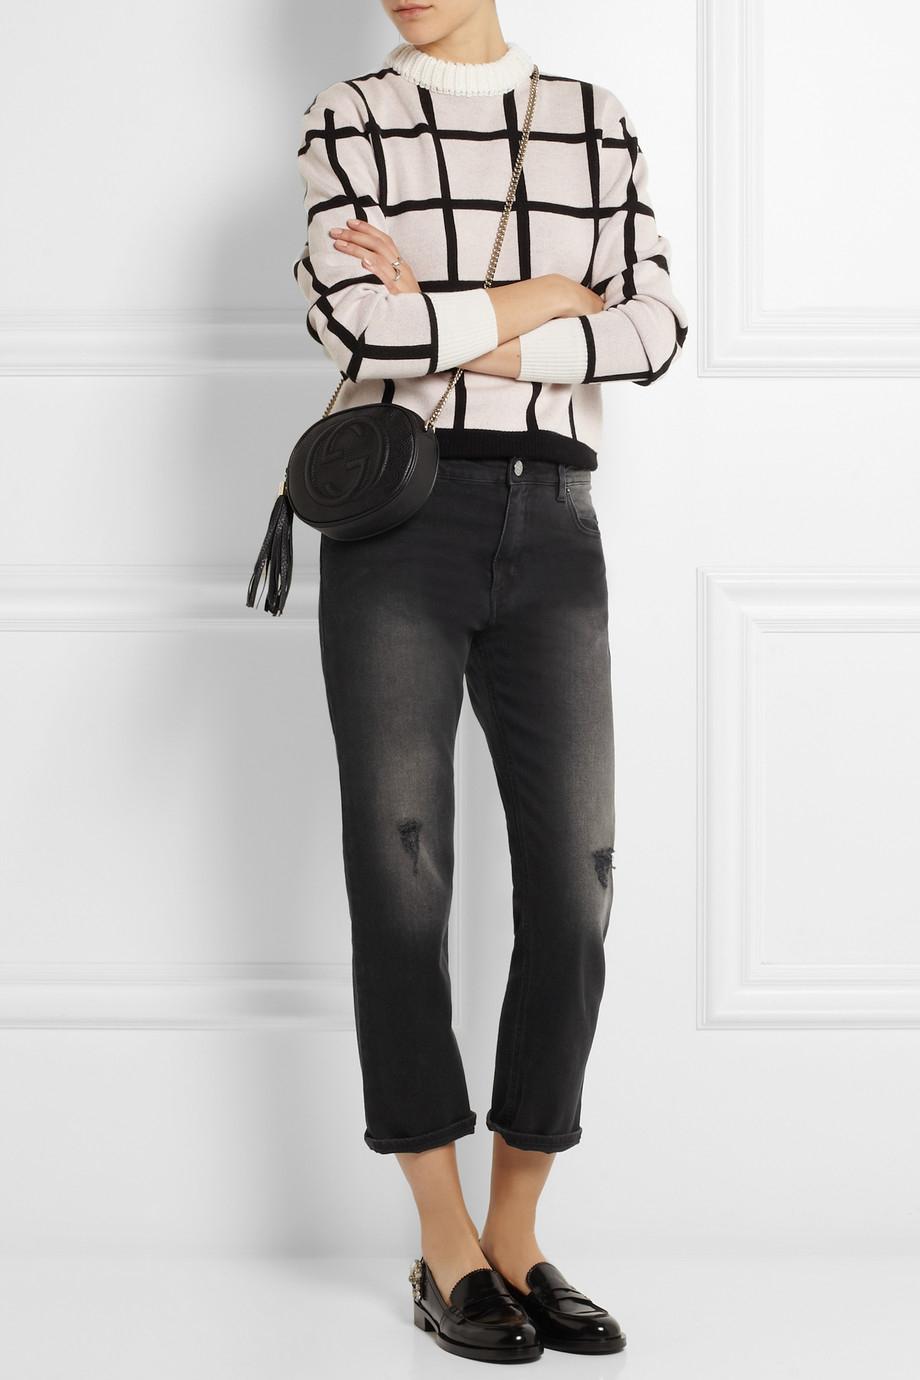 Acne Studios Pop Given Trash Distressed Mid-Rise Boyfriend Jeans in Black